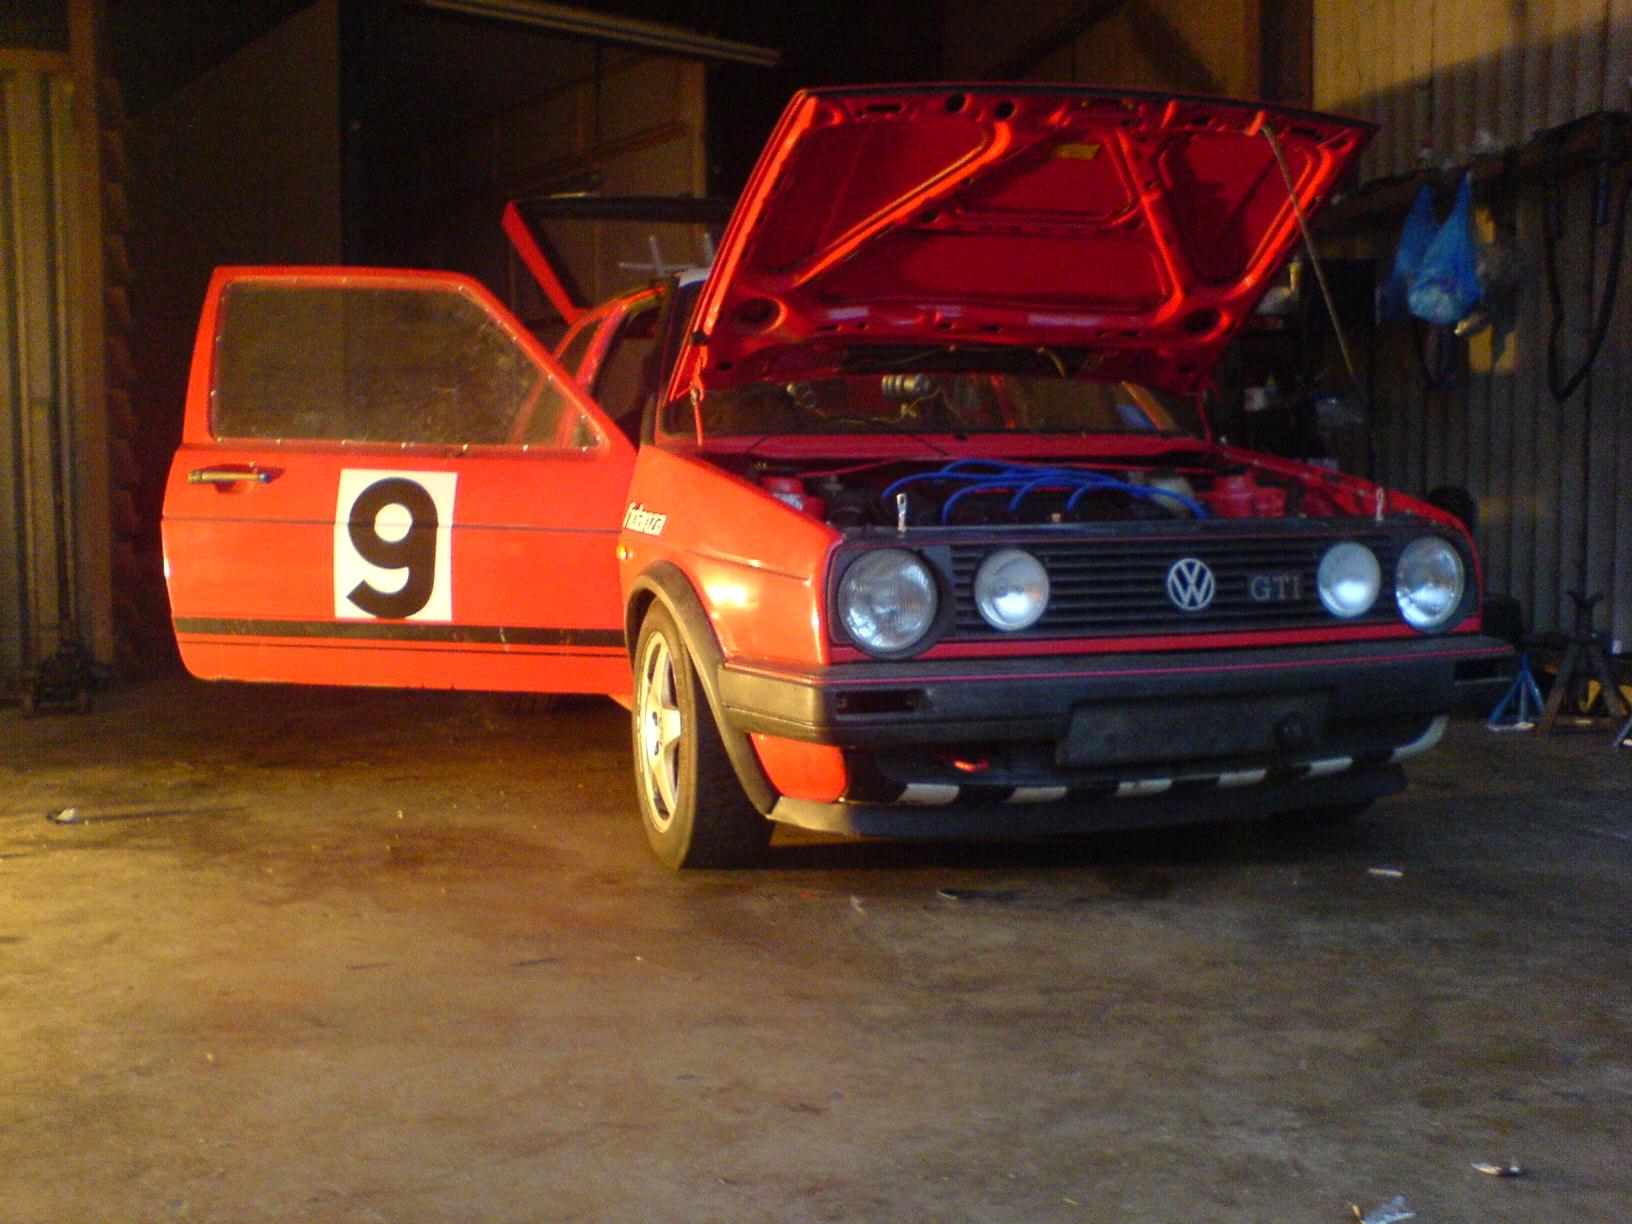 1989 Volkswagen Golf mk2 vr6